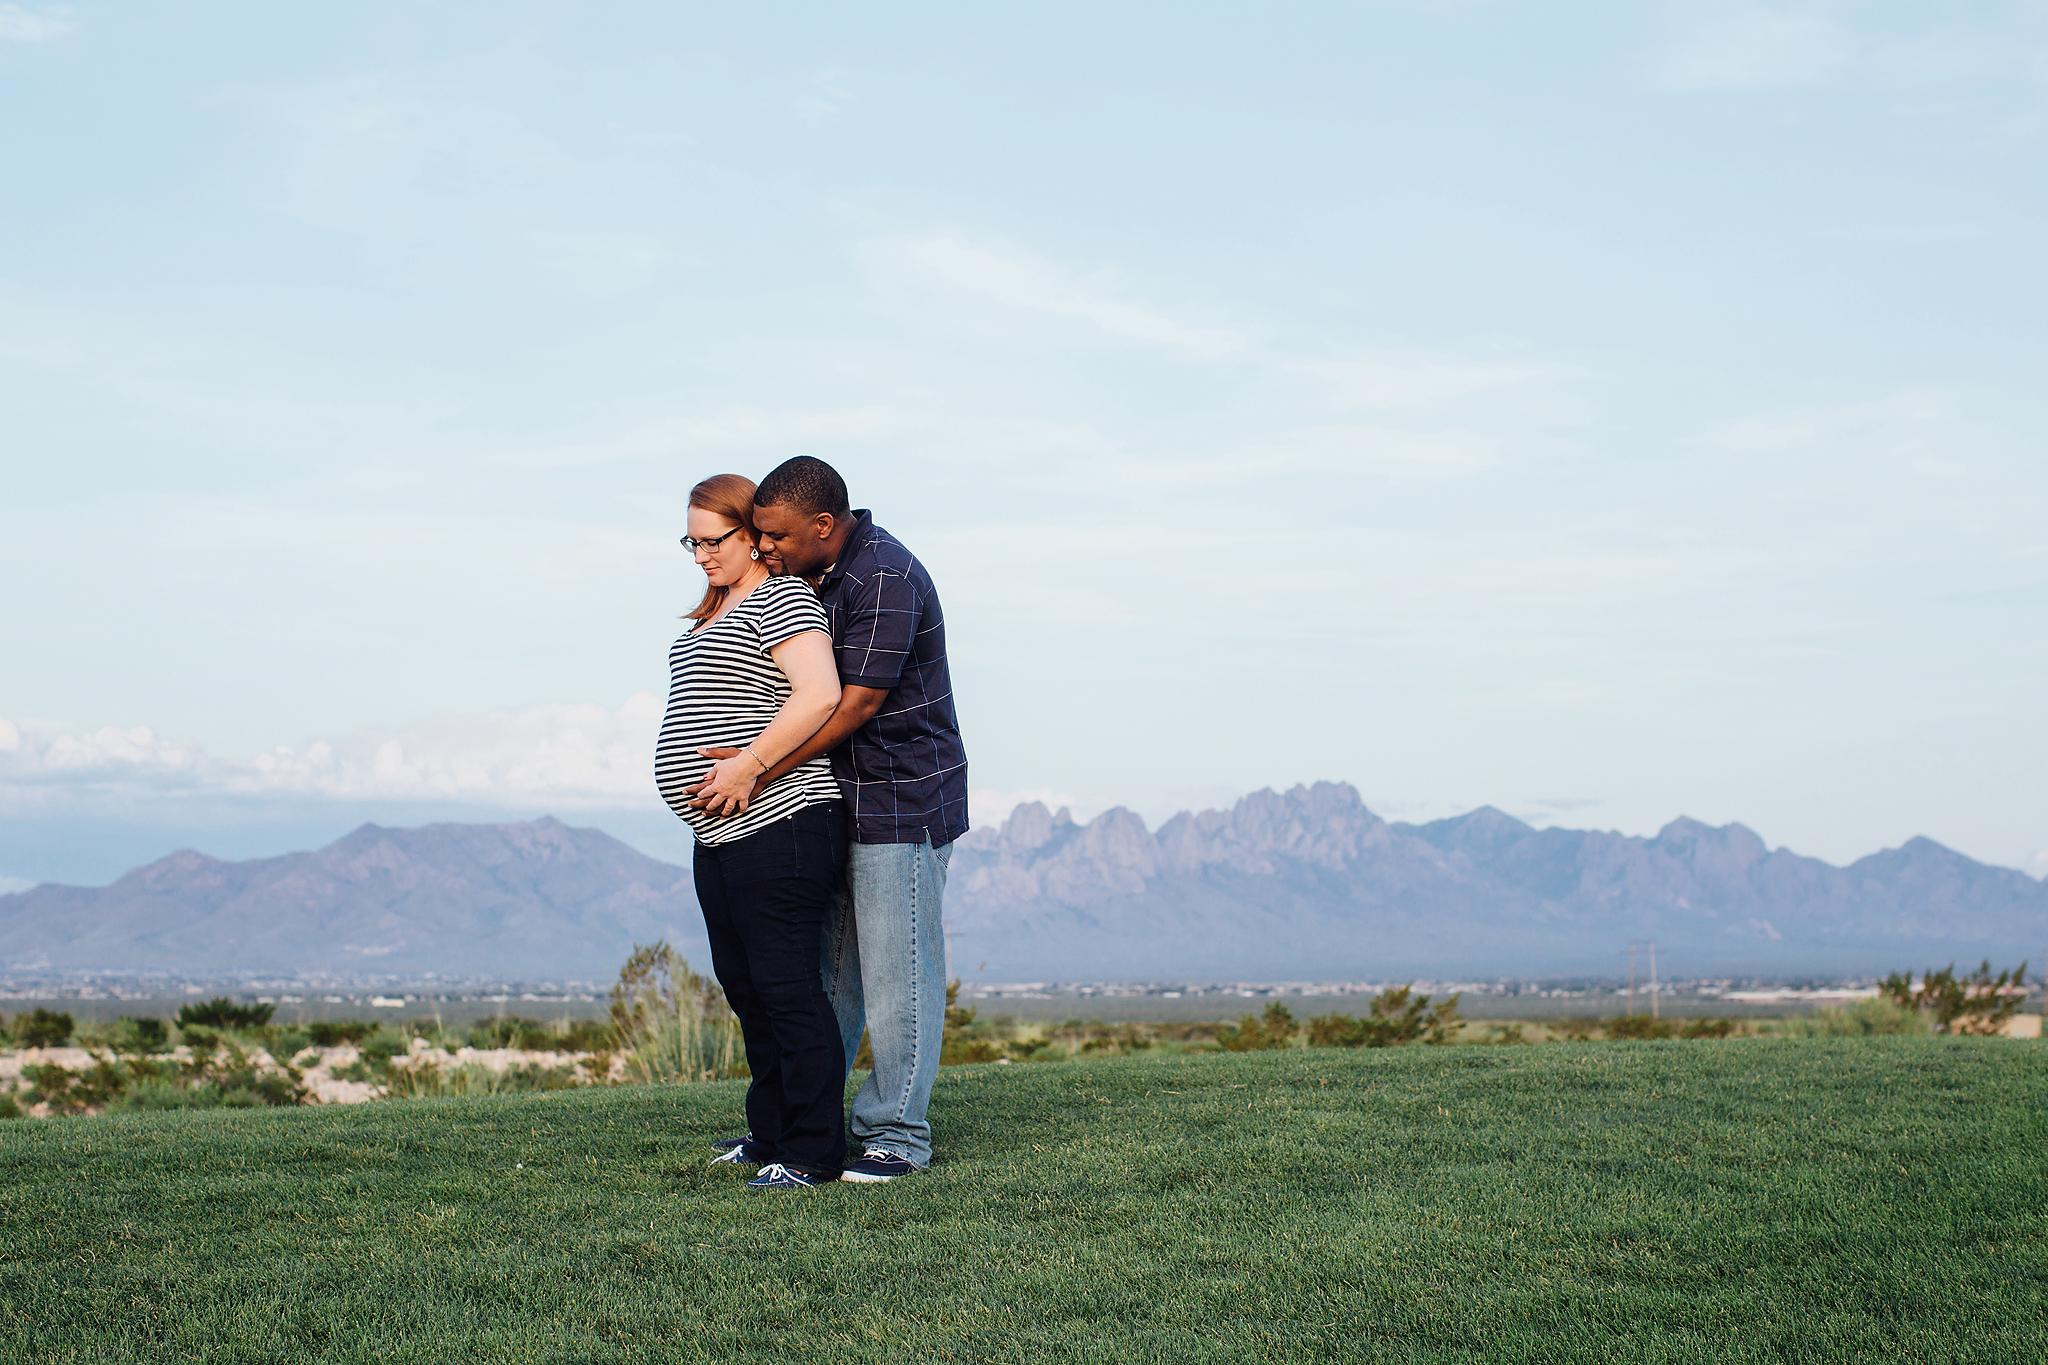 las-cruces-maternity-photographer-4.jpg